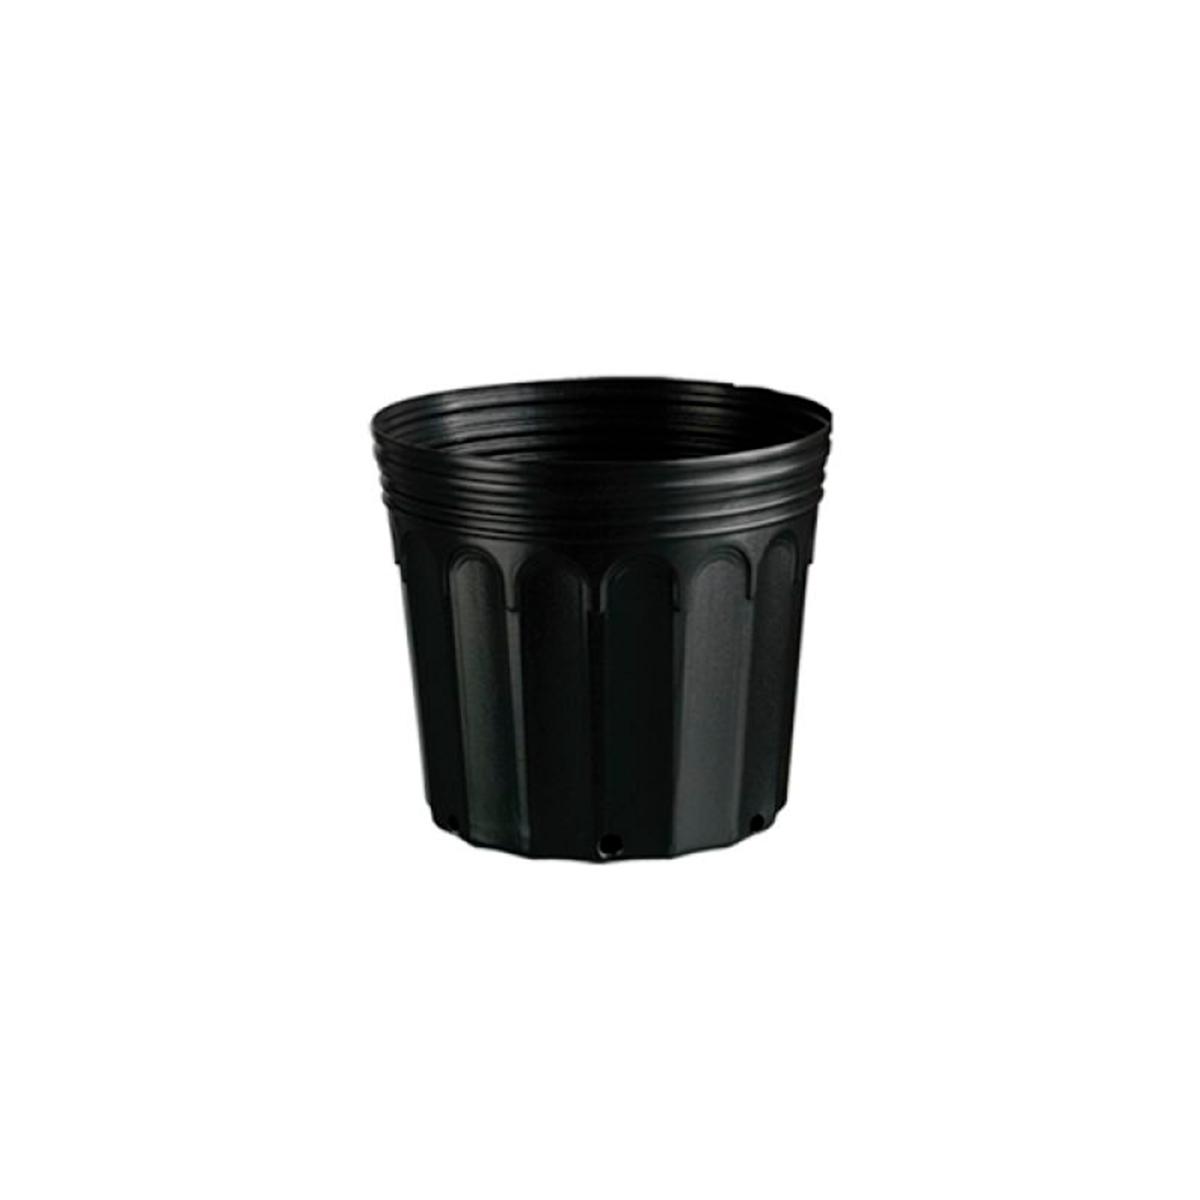 Kit 500 Embalagem Vaso para Mudas Plástico 3,6L